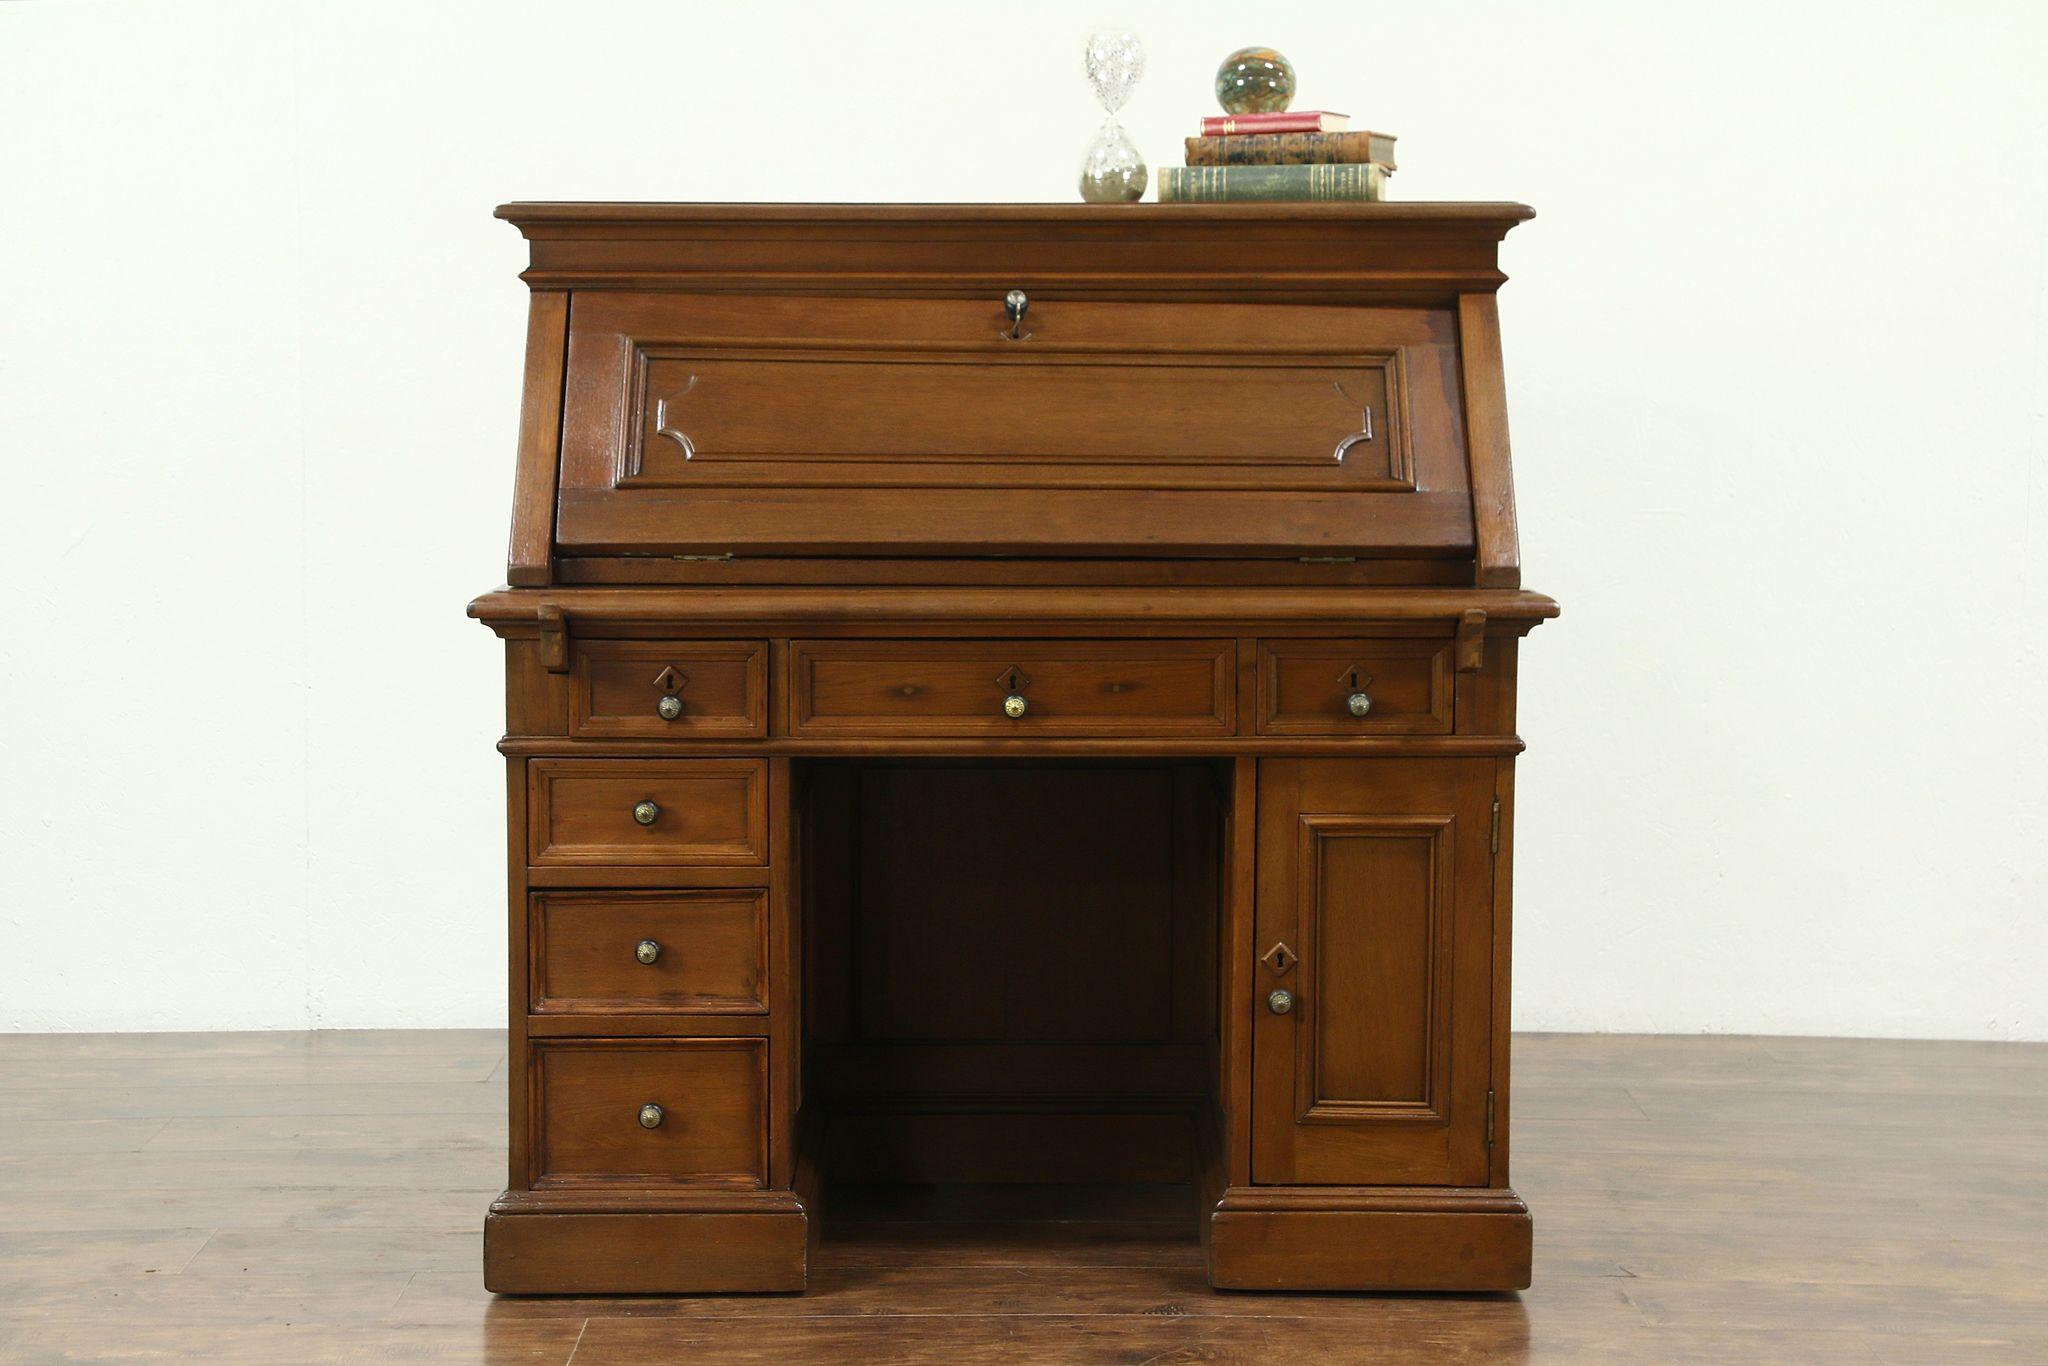 Victorian Antique 1860 S Walnut Library Desk Or Dropfront Secretary 28660 Harp Gallery